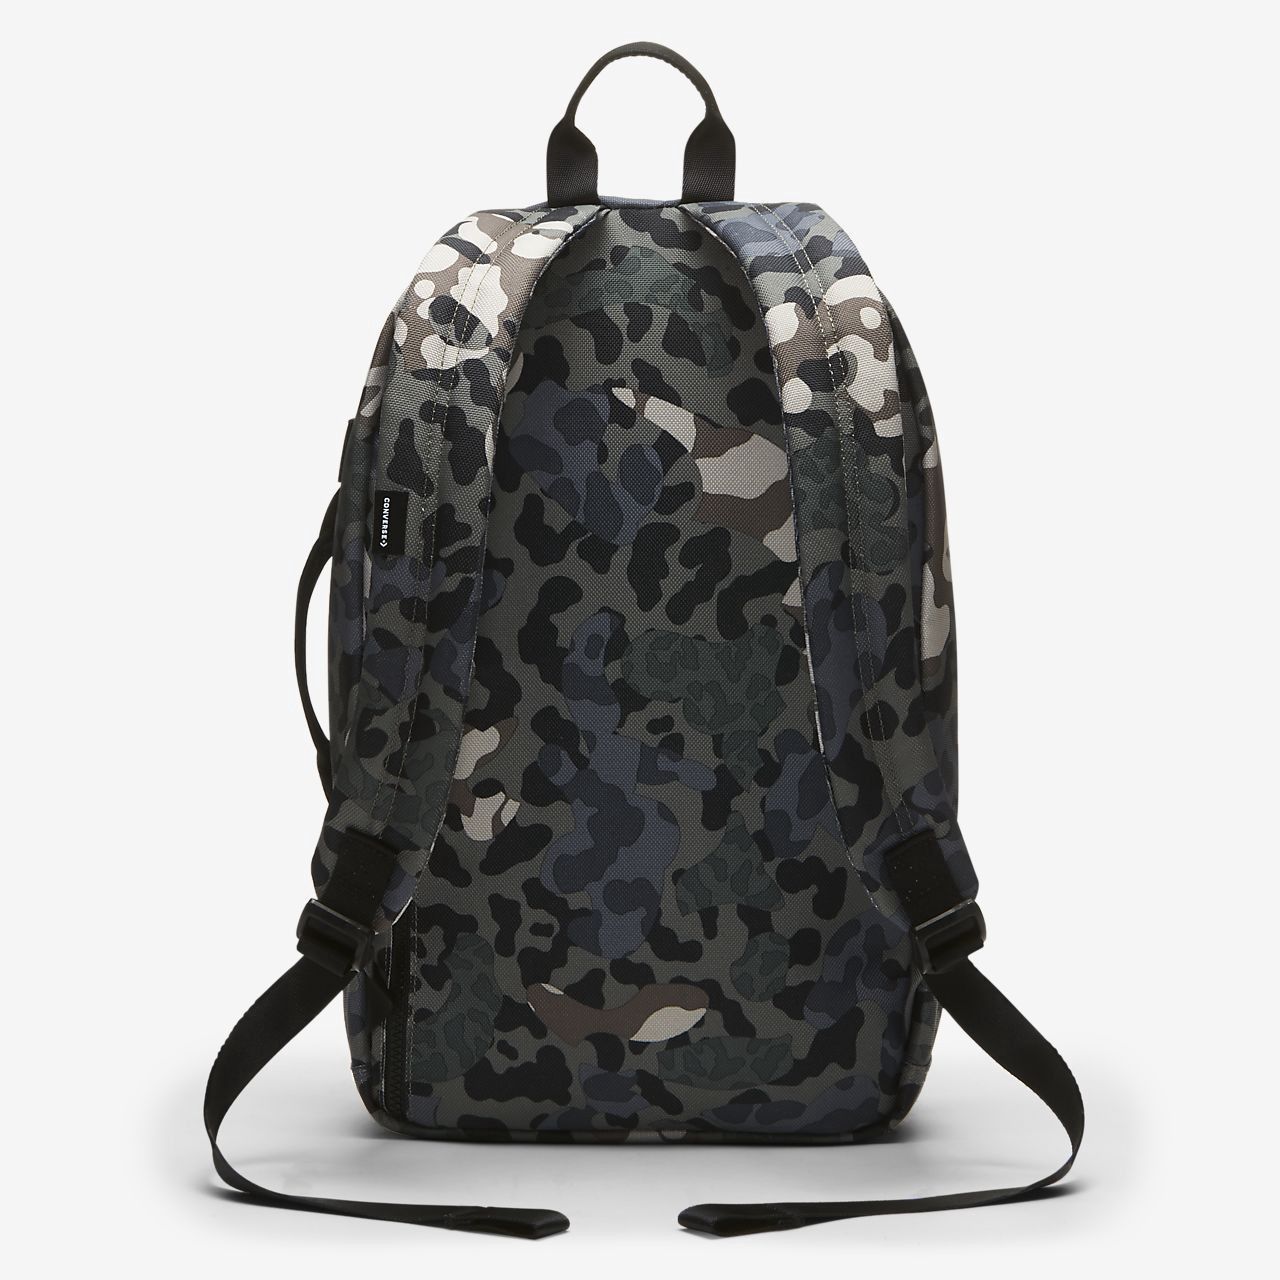 54a6d2e8cf20 Converse CORDURA® Street 22 Backpack by Converse in 2018